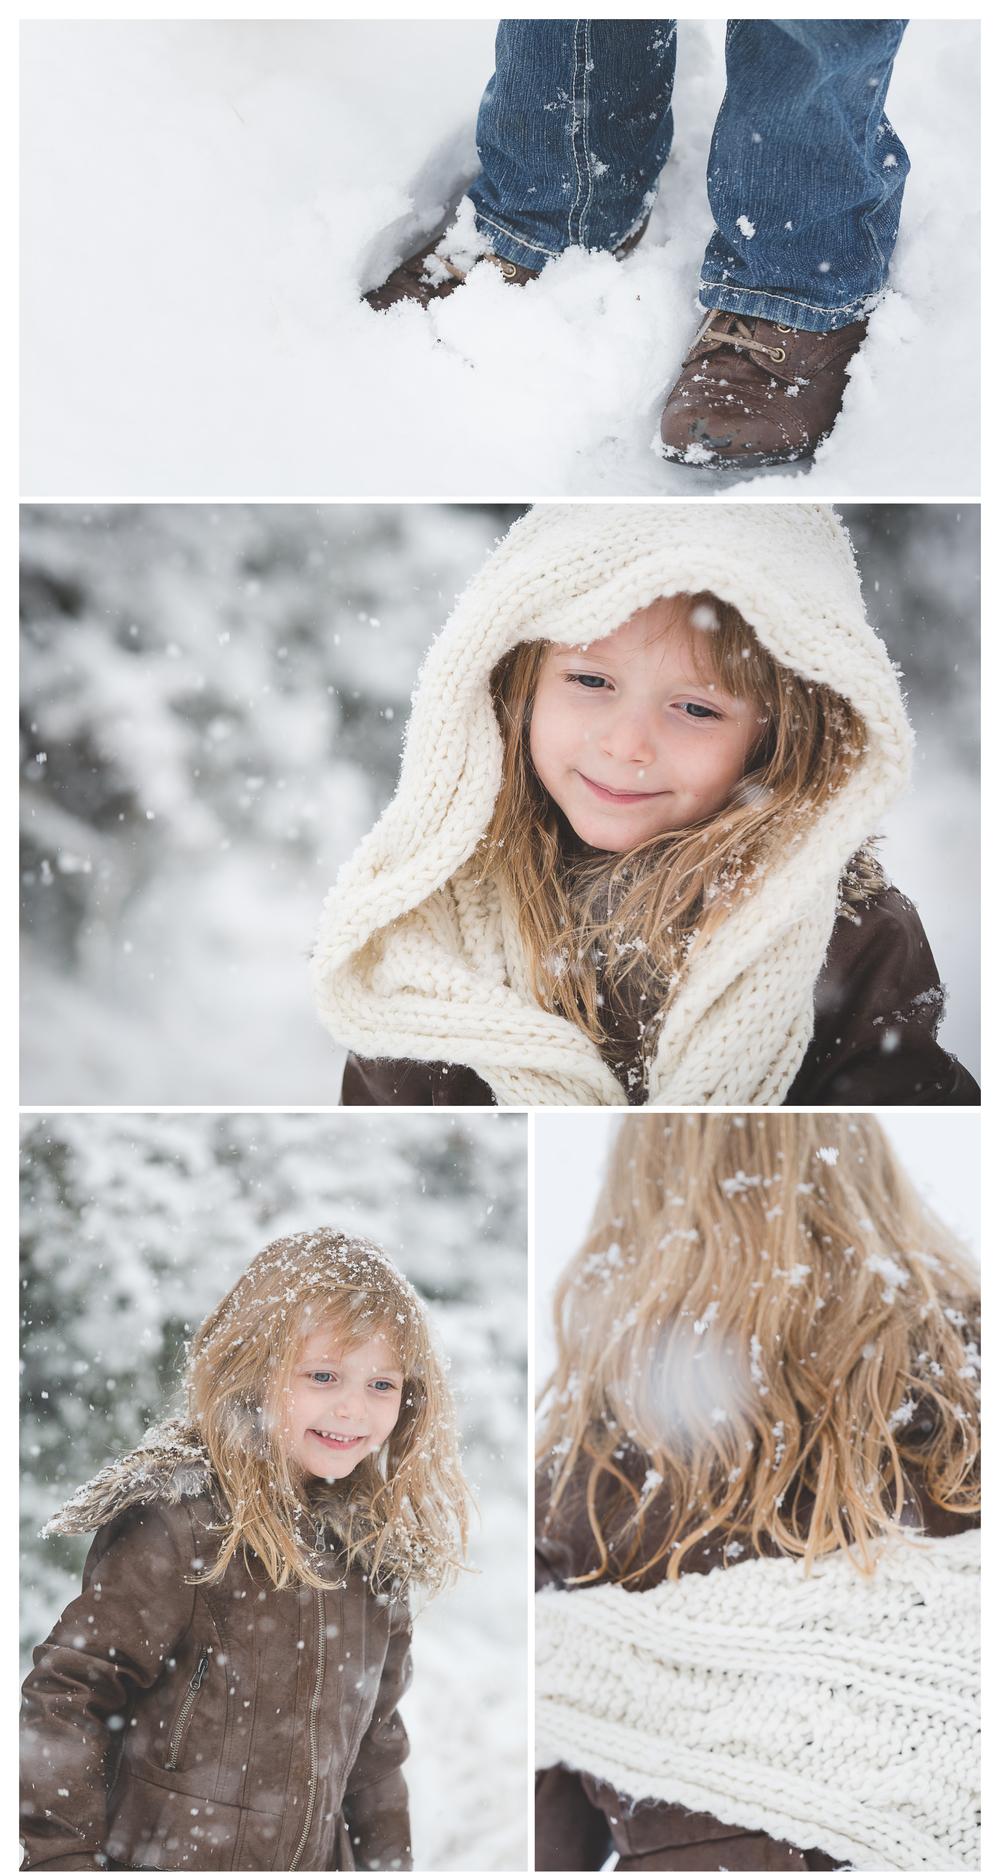 snow blog-2.jpg